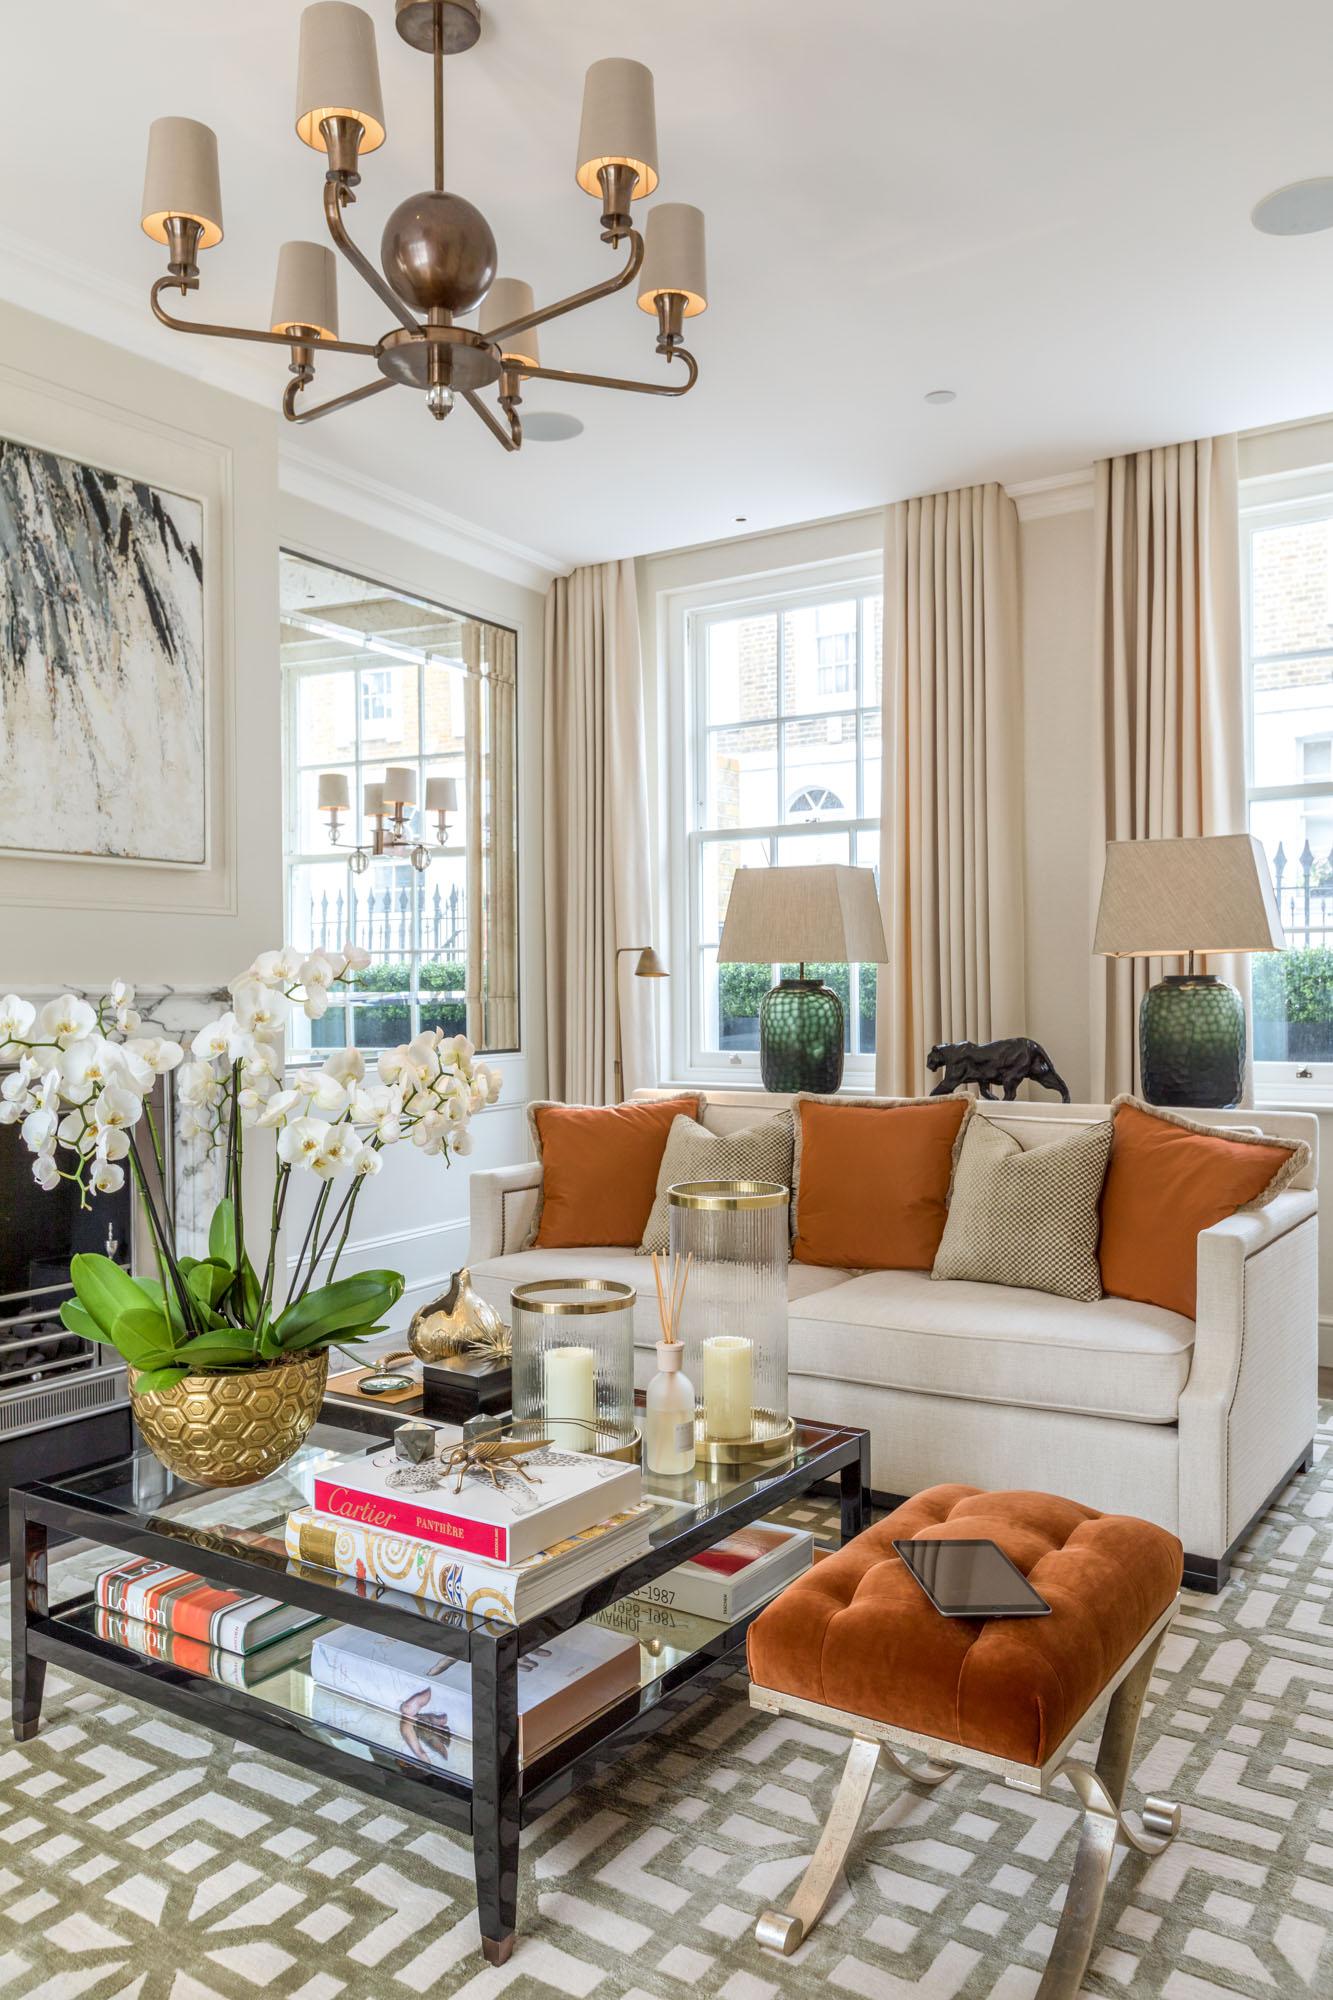 jonathan bond, interior photographer, living room, chelsea, london